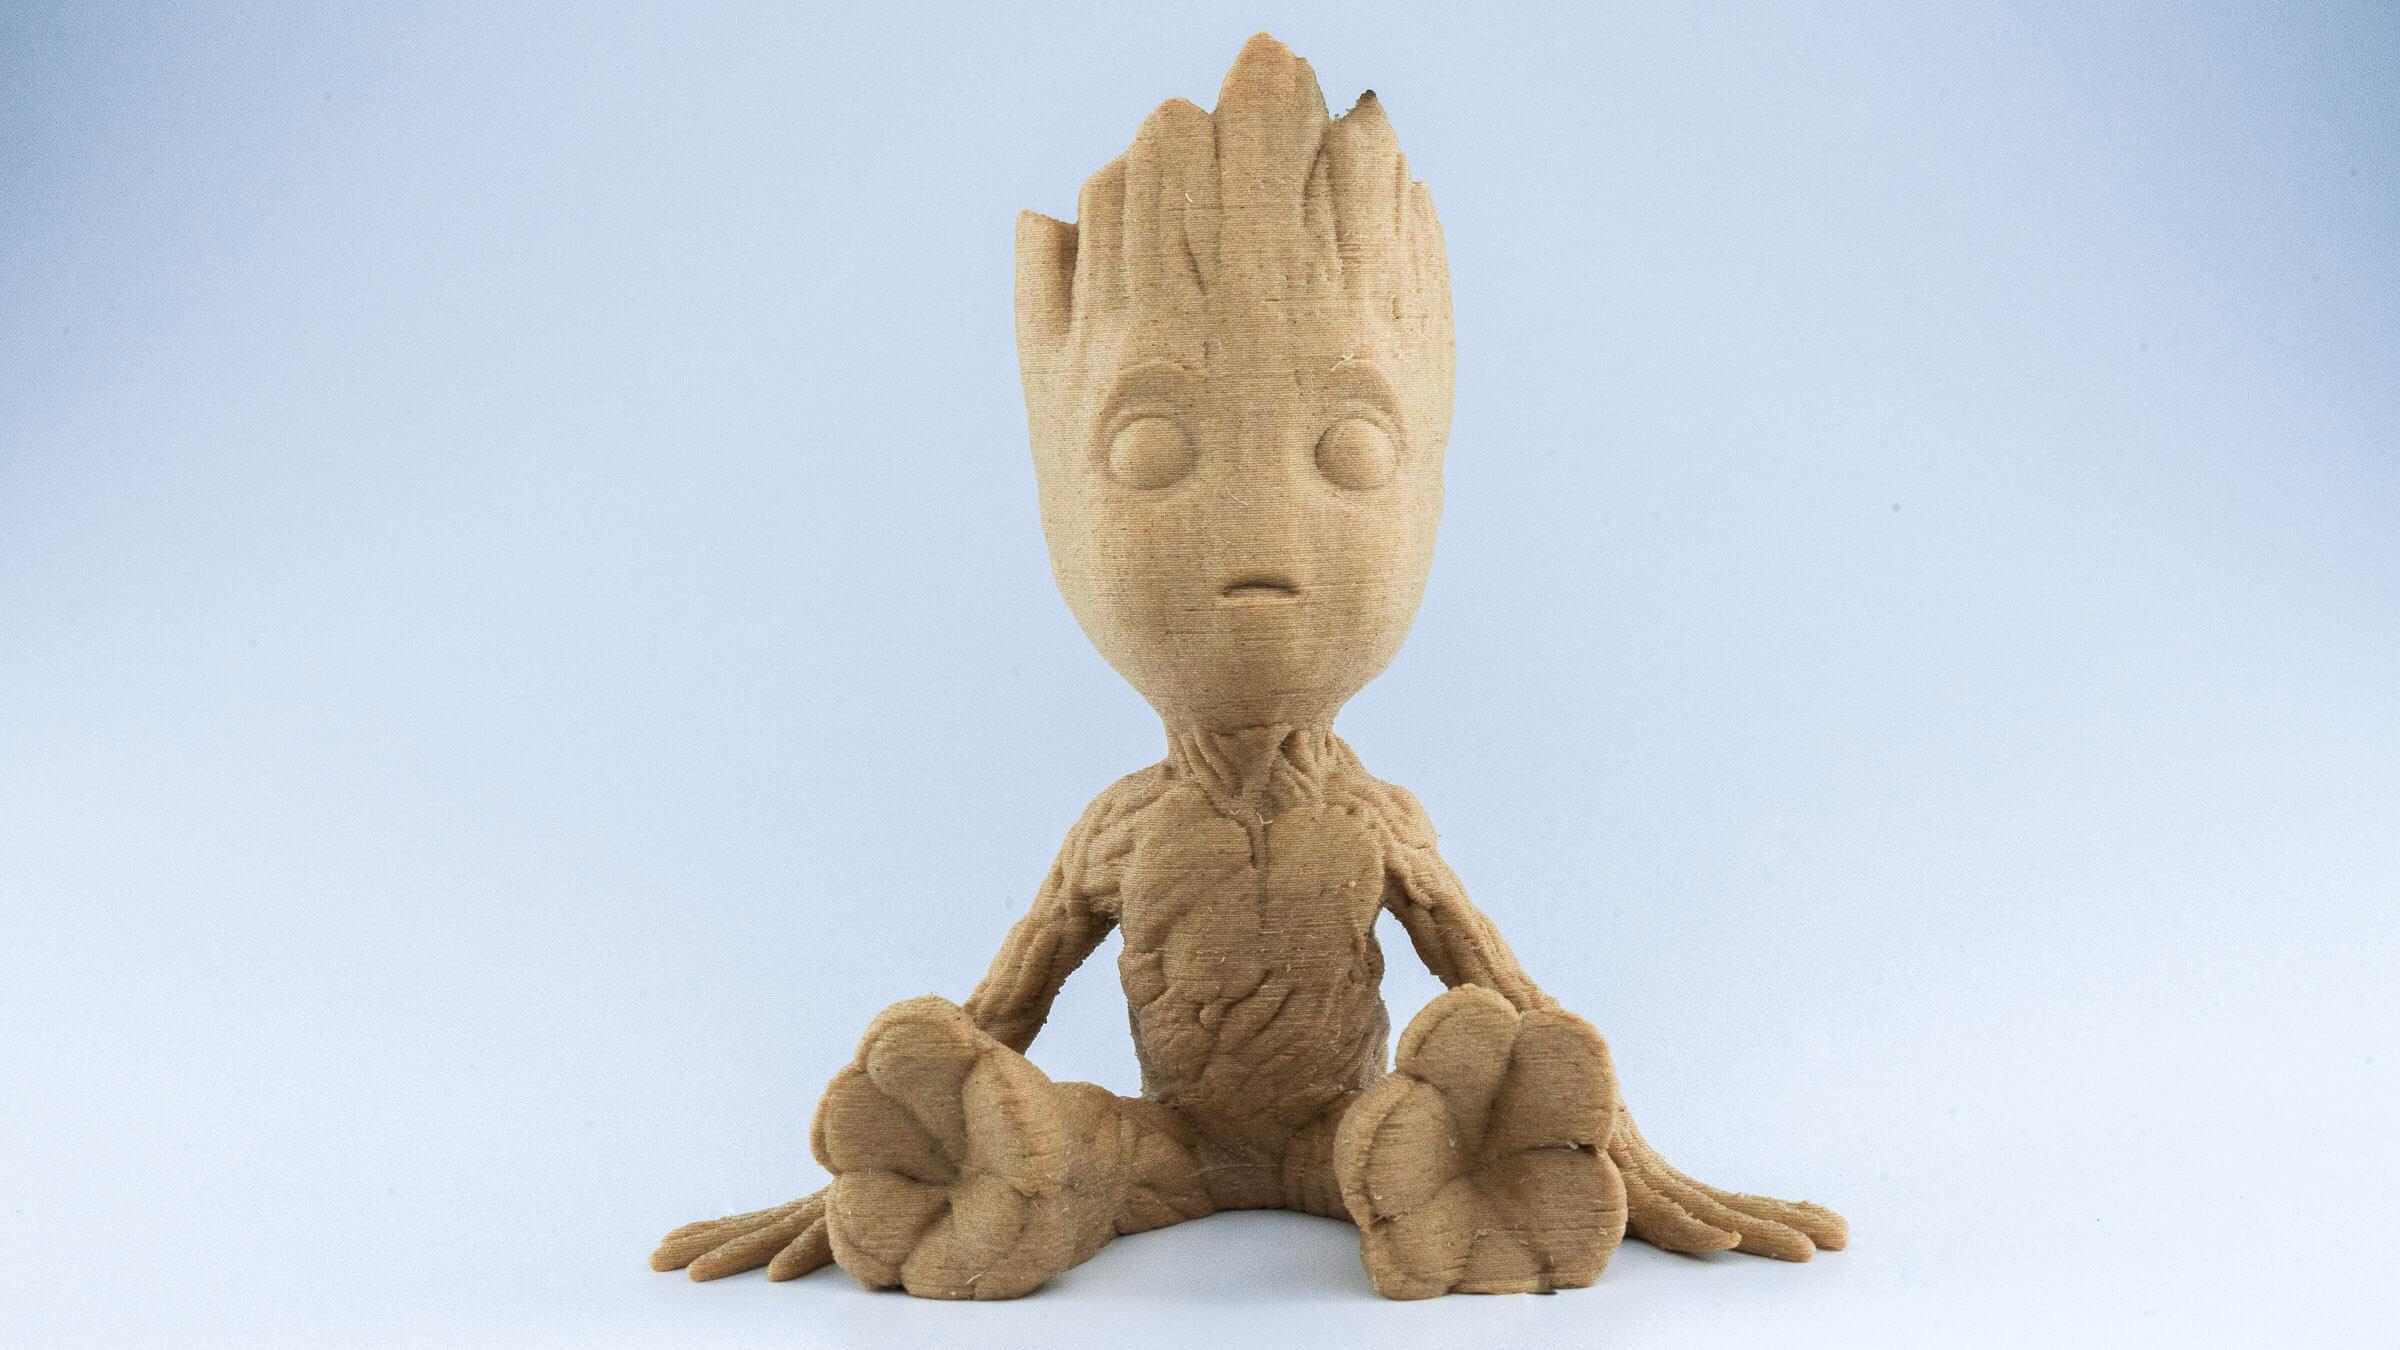 Grooth Figur mit holzhaltigem Material 3d gedruckt